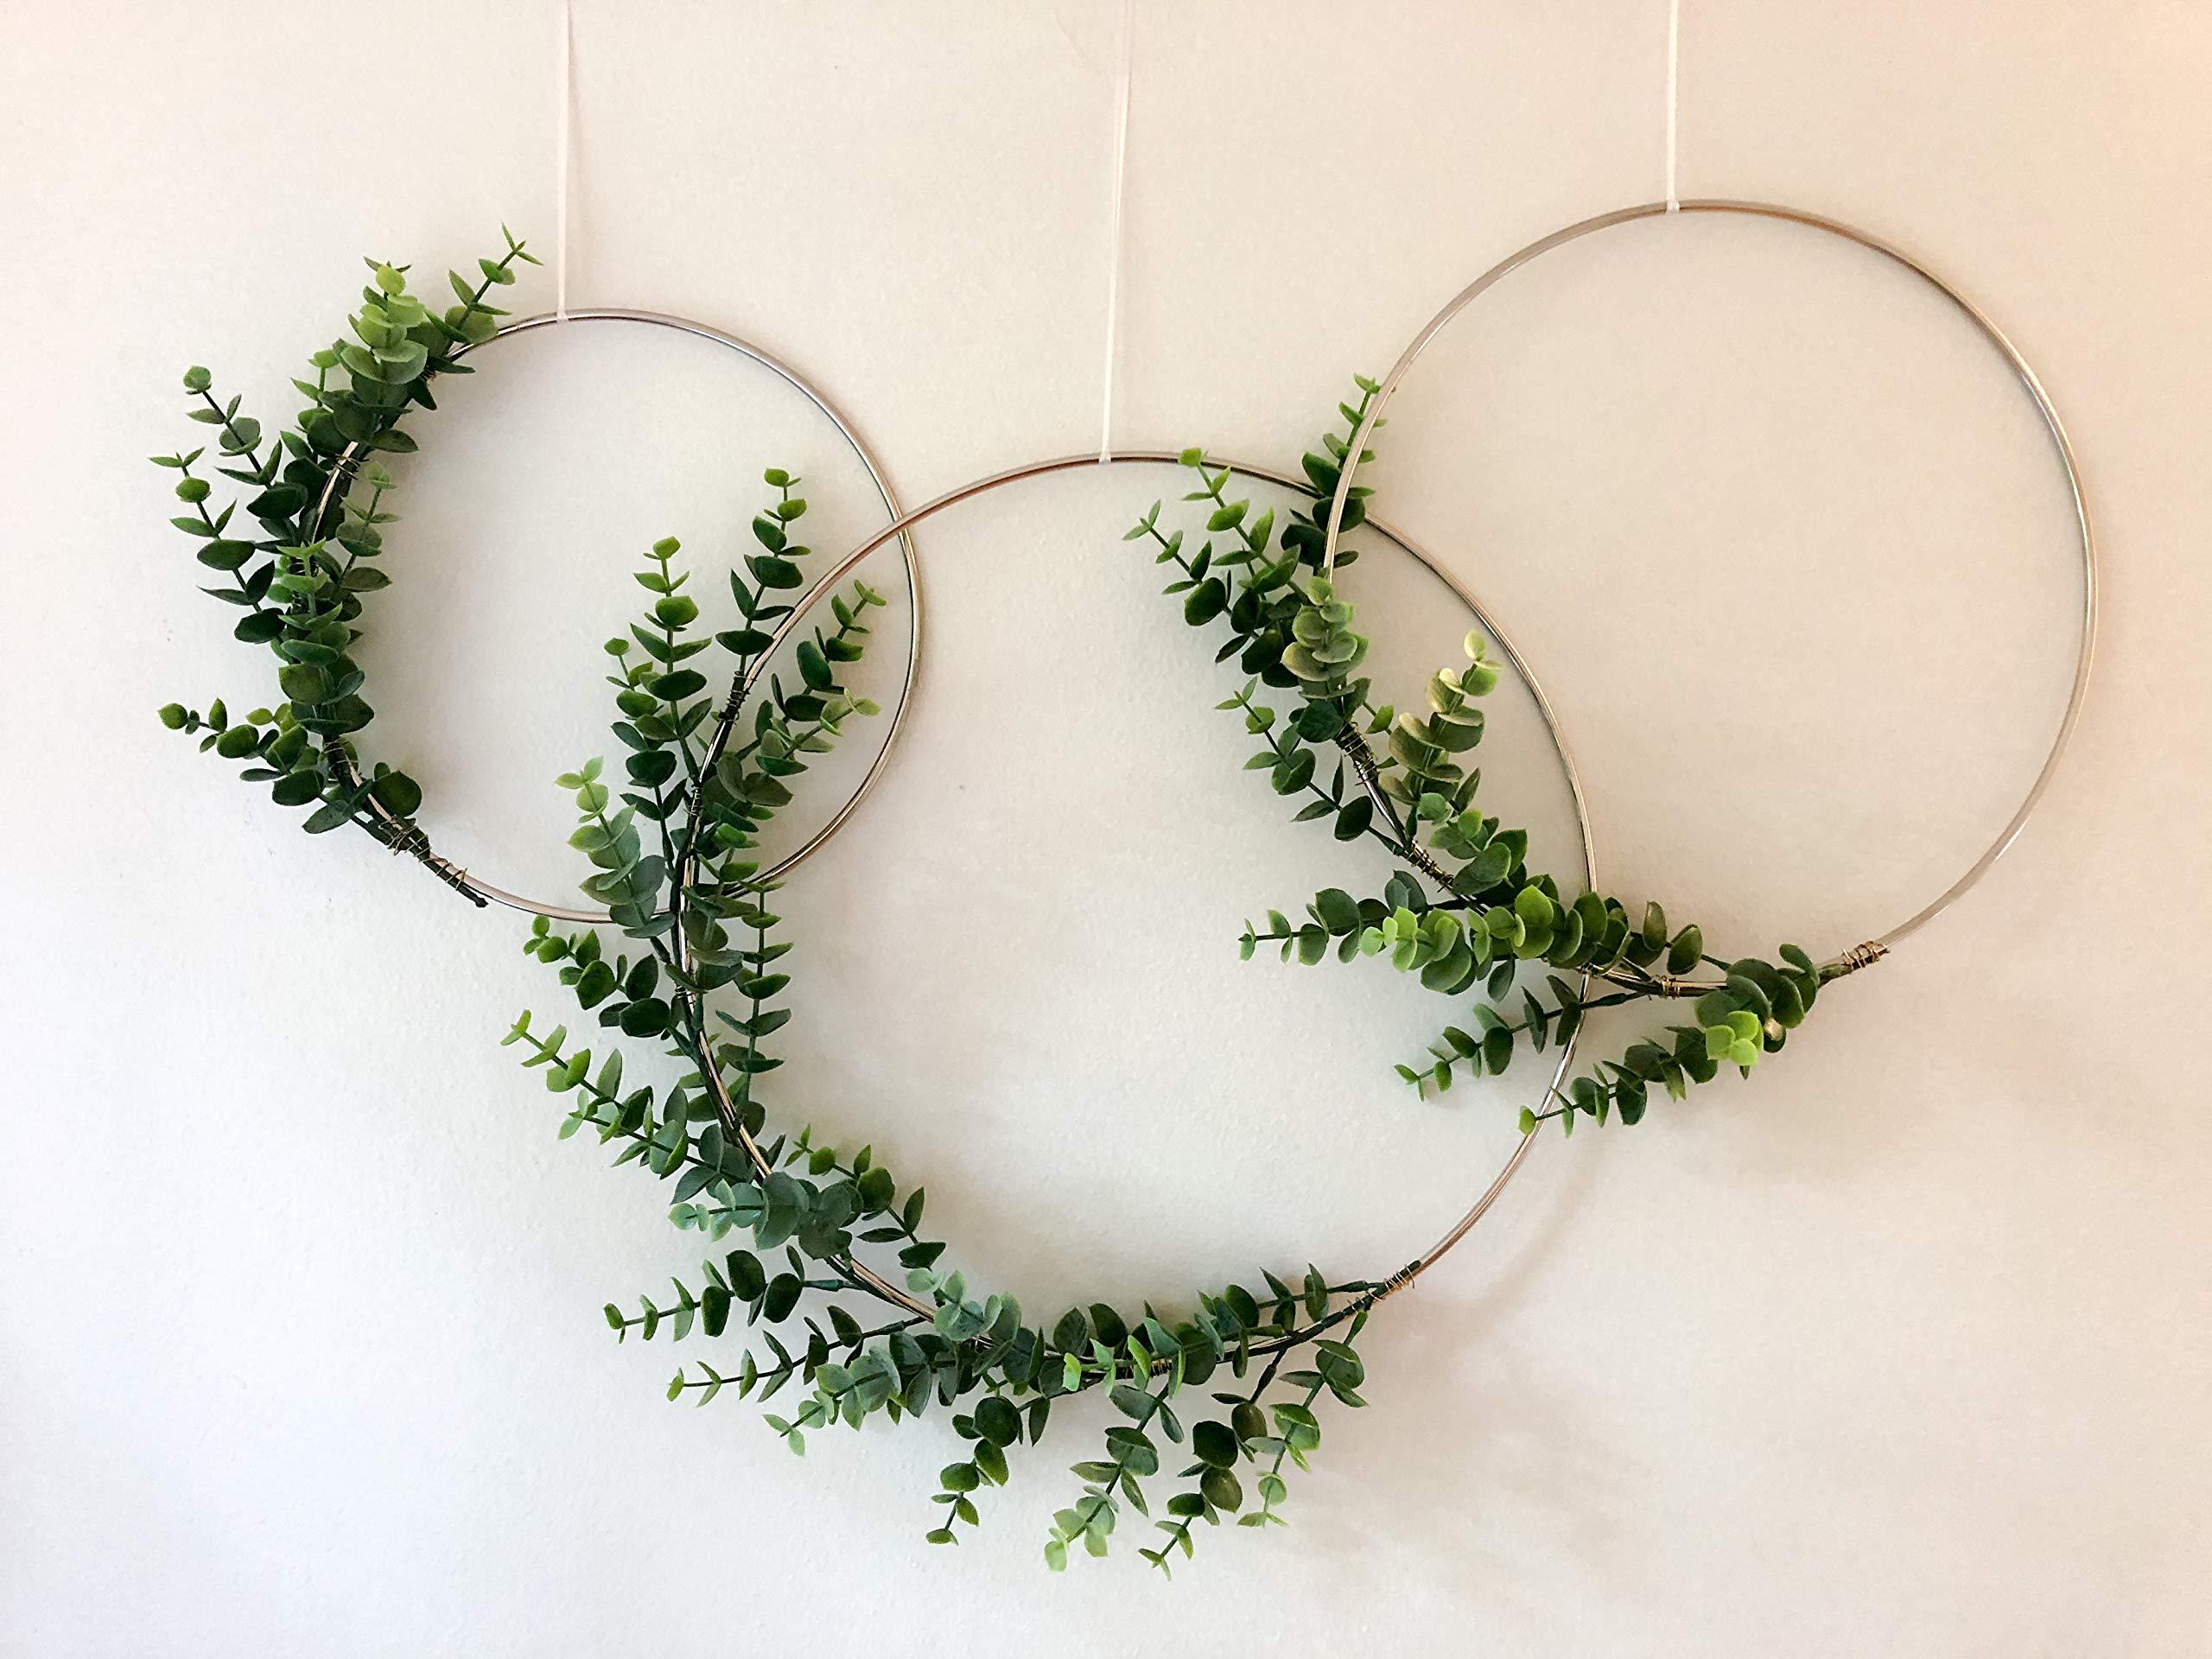 Designs-by-DH-Metal-Hoop-Wreath-Shabby-Chic-Eucalyptus-Succulent-Green-Simple-Wedding-Baby-Nursery-Rustic-Farmhouse-Scandinavian-Home-Decor